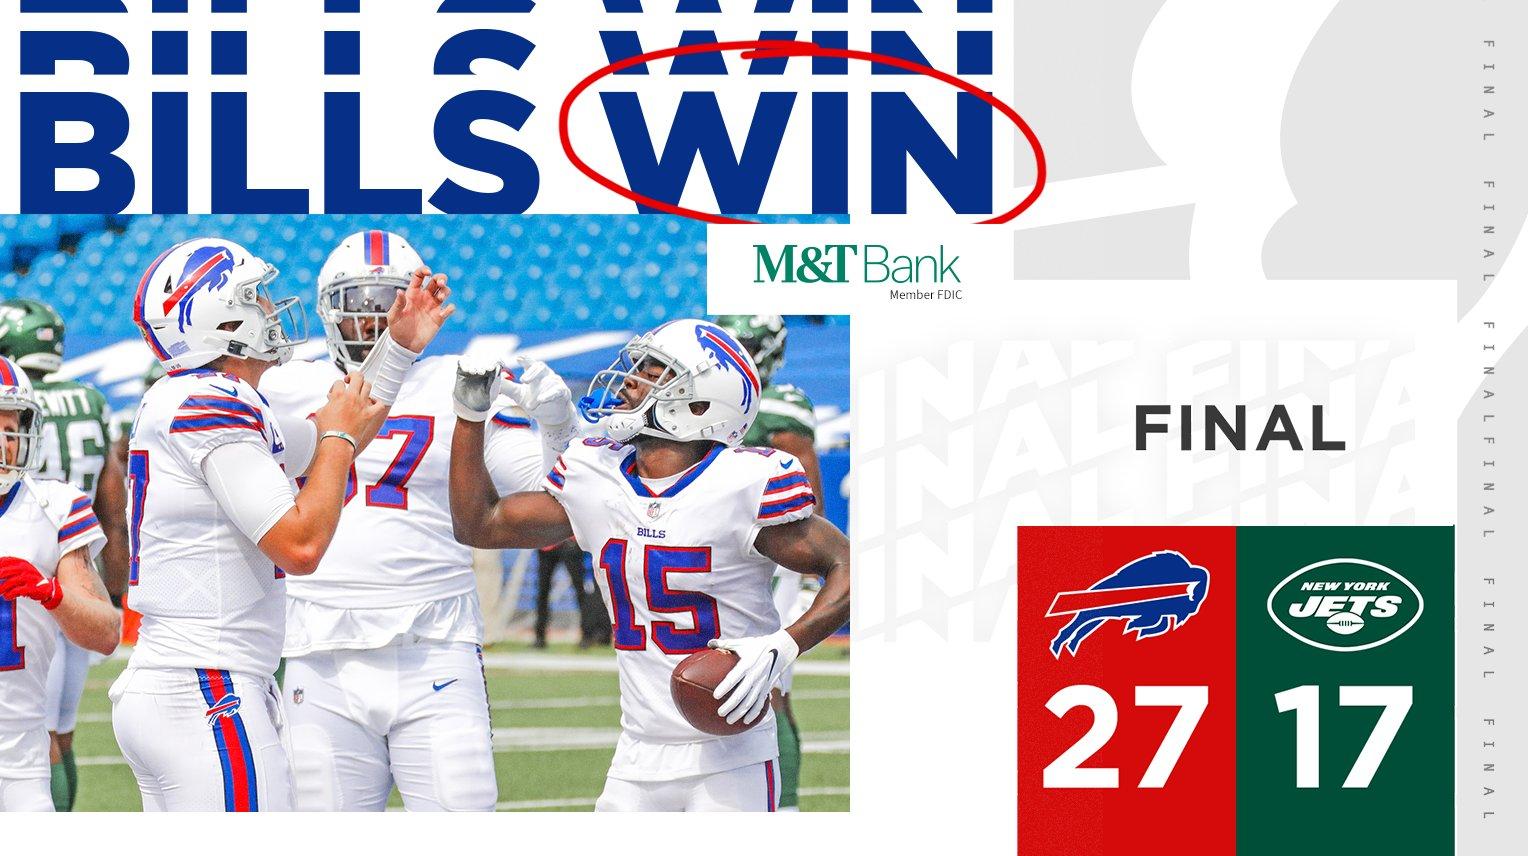 Buffalo Bills On Twitter Bills Win Watch All The Highlights Https T Co 1otdtfp4rt